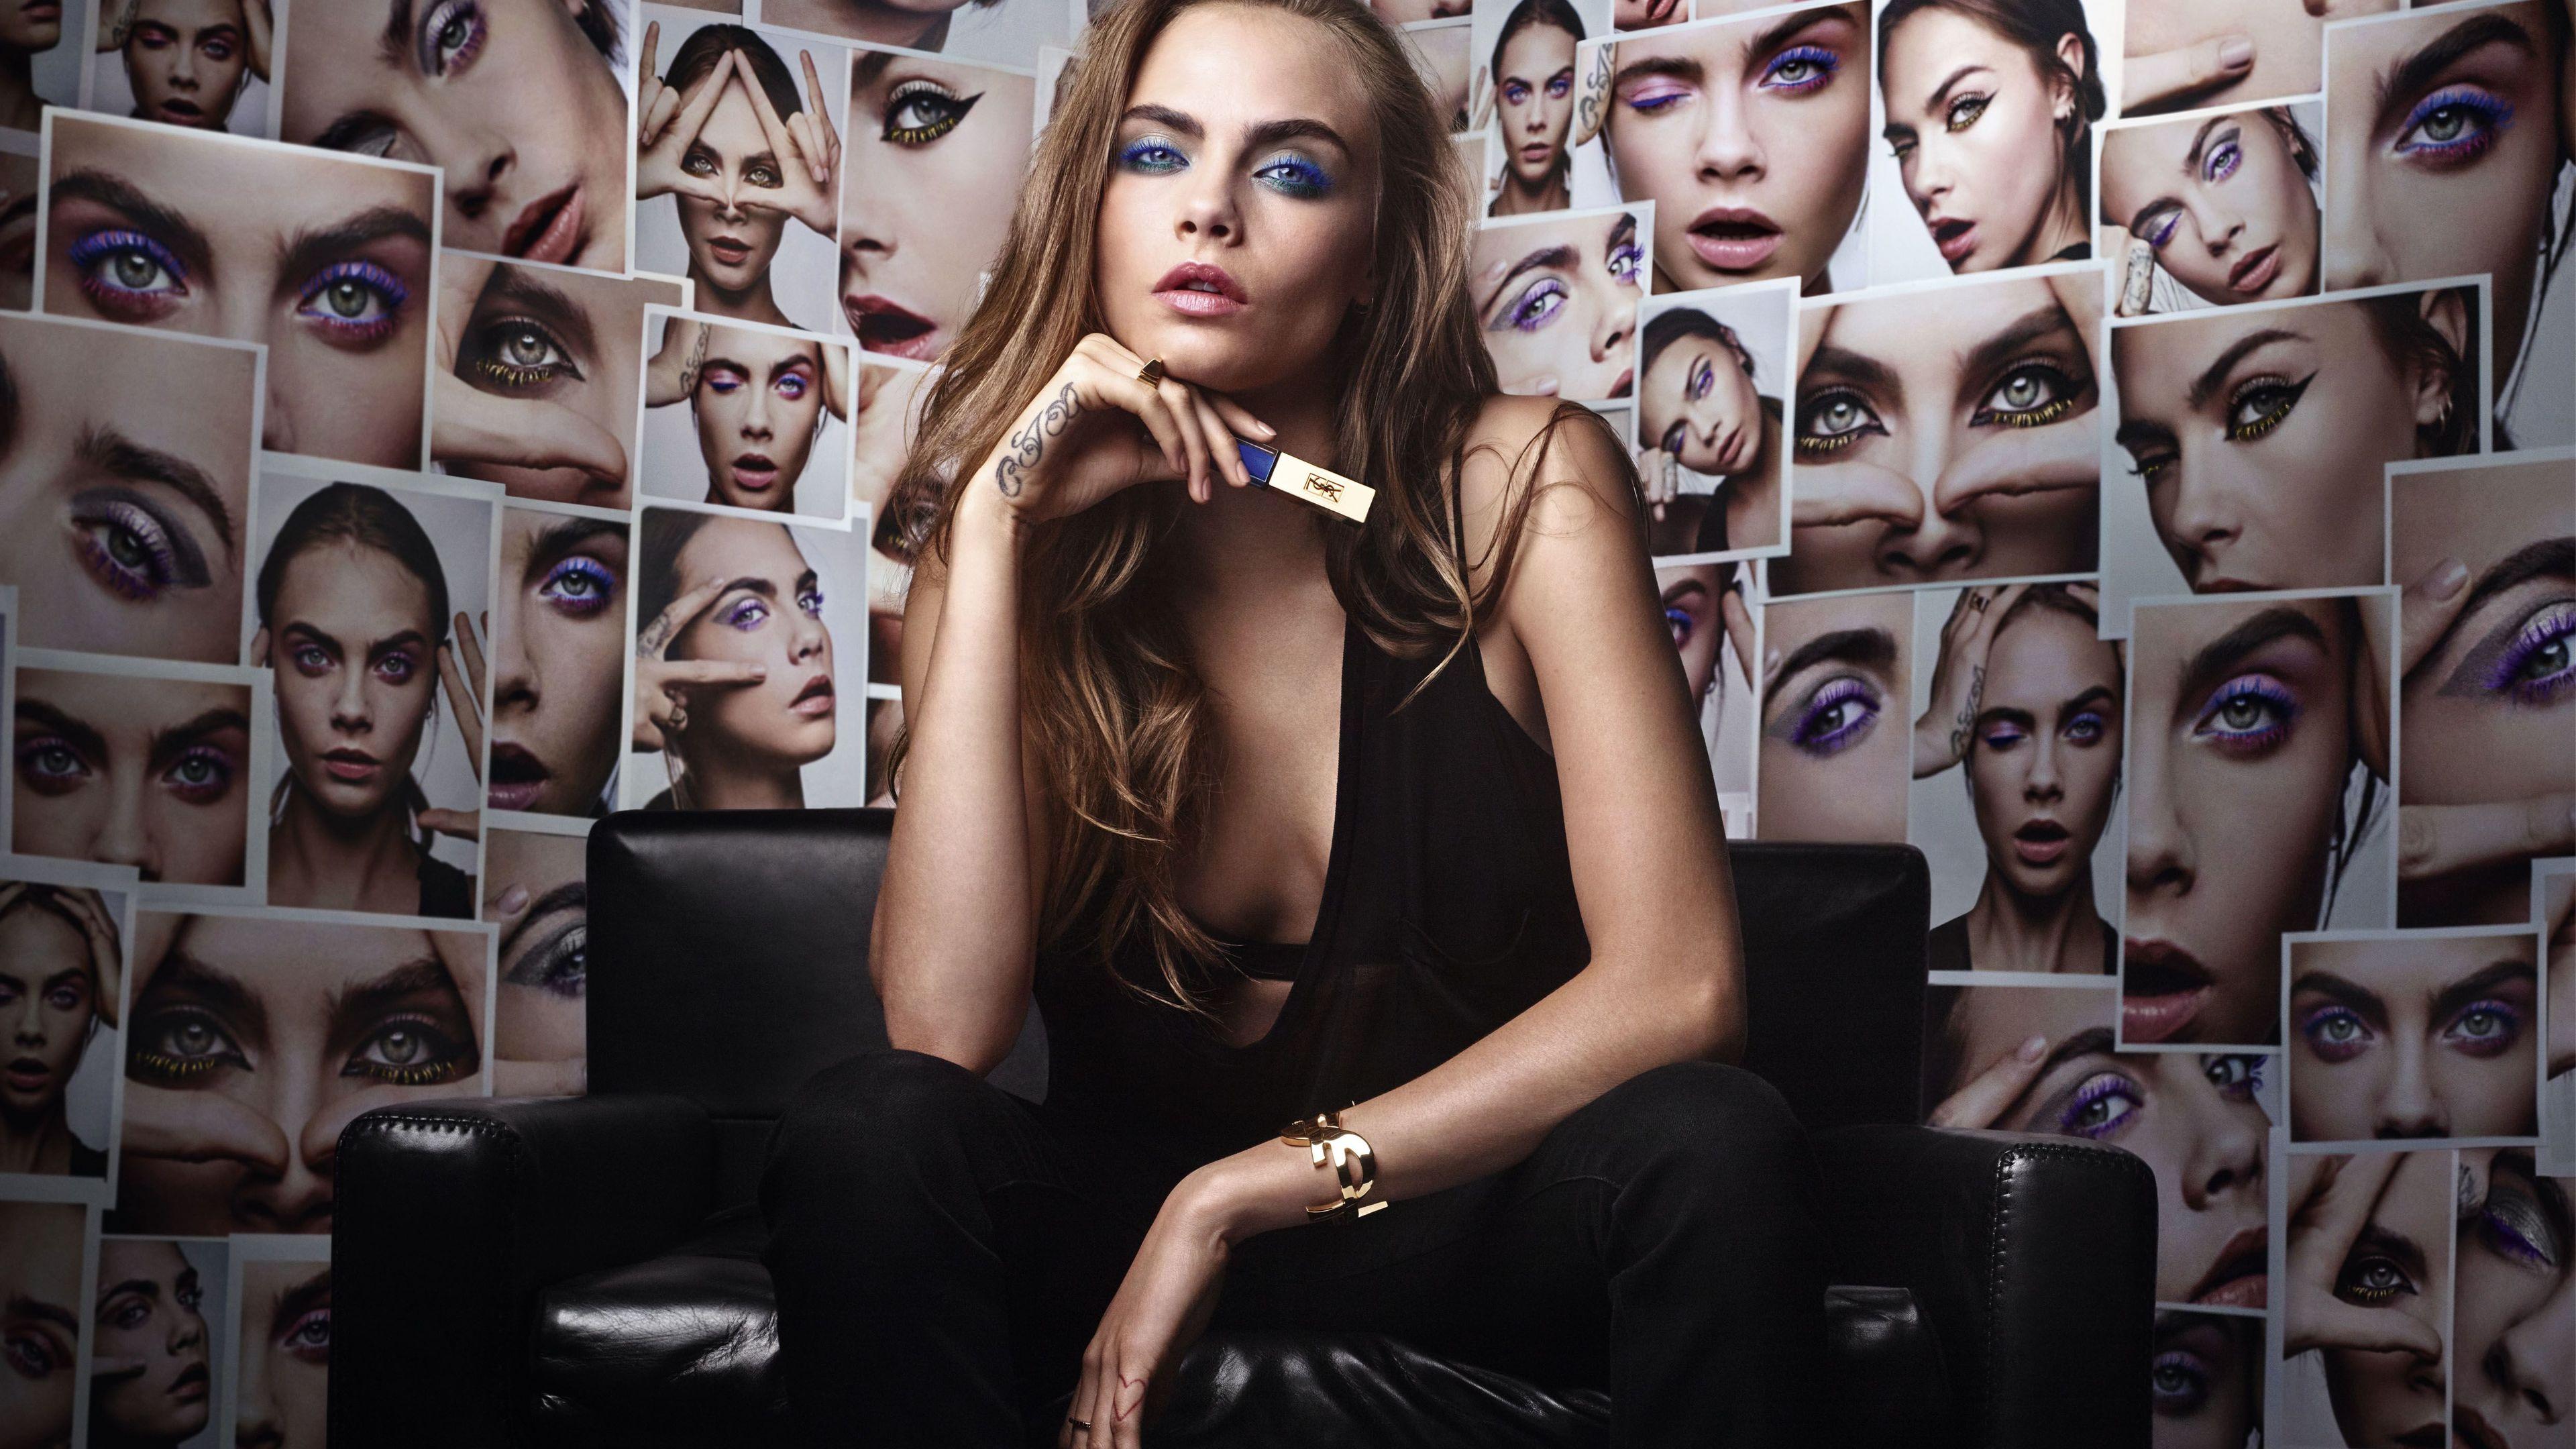 cara delevingne ysl 2019 1536946982 - Cara Delevingne Ysl 2019 - model wallpapers, hd-wallpapers, girls wallpapers, celebrities wallpapers, cara delevingne wallpapers, 5k wallpapers, 4k-wallpapers